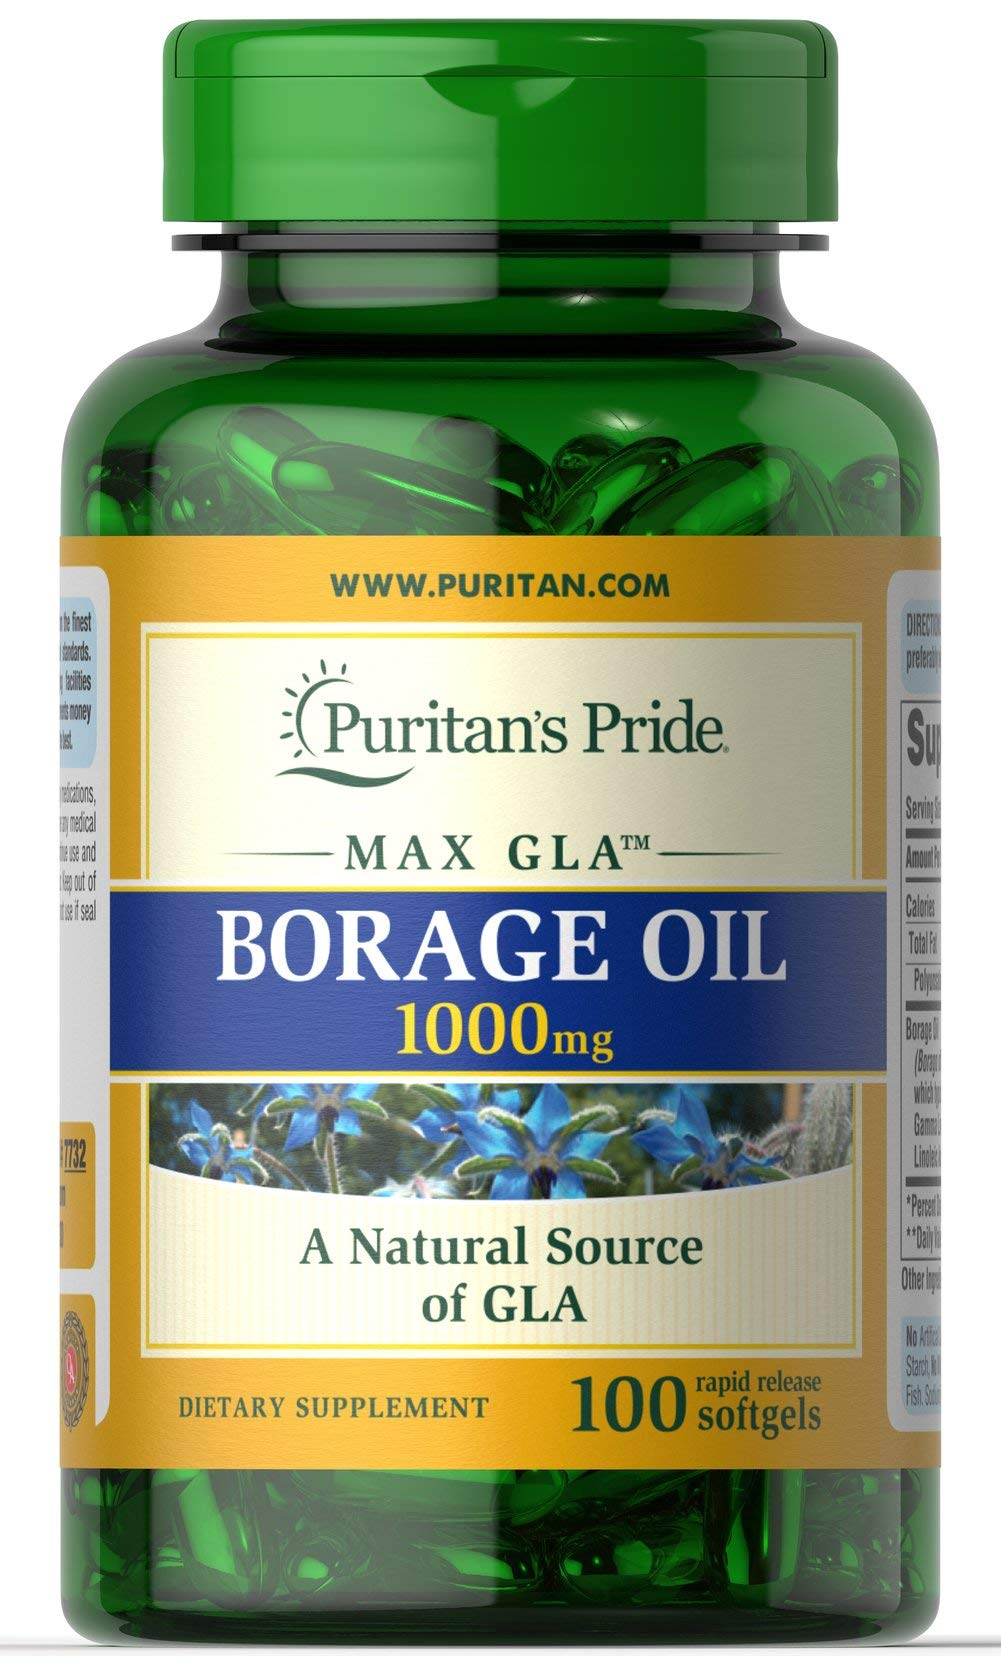 Puritans Pride Borage Oil, 1 Gram by Puritan's Pride